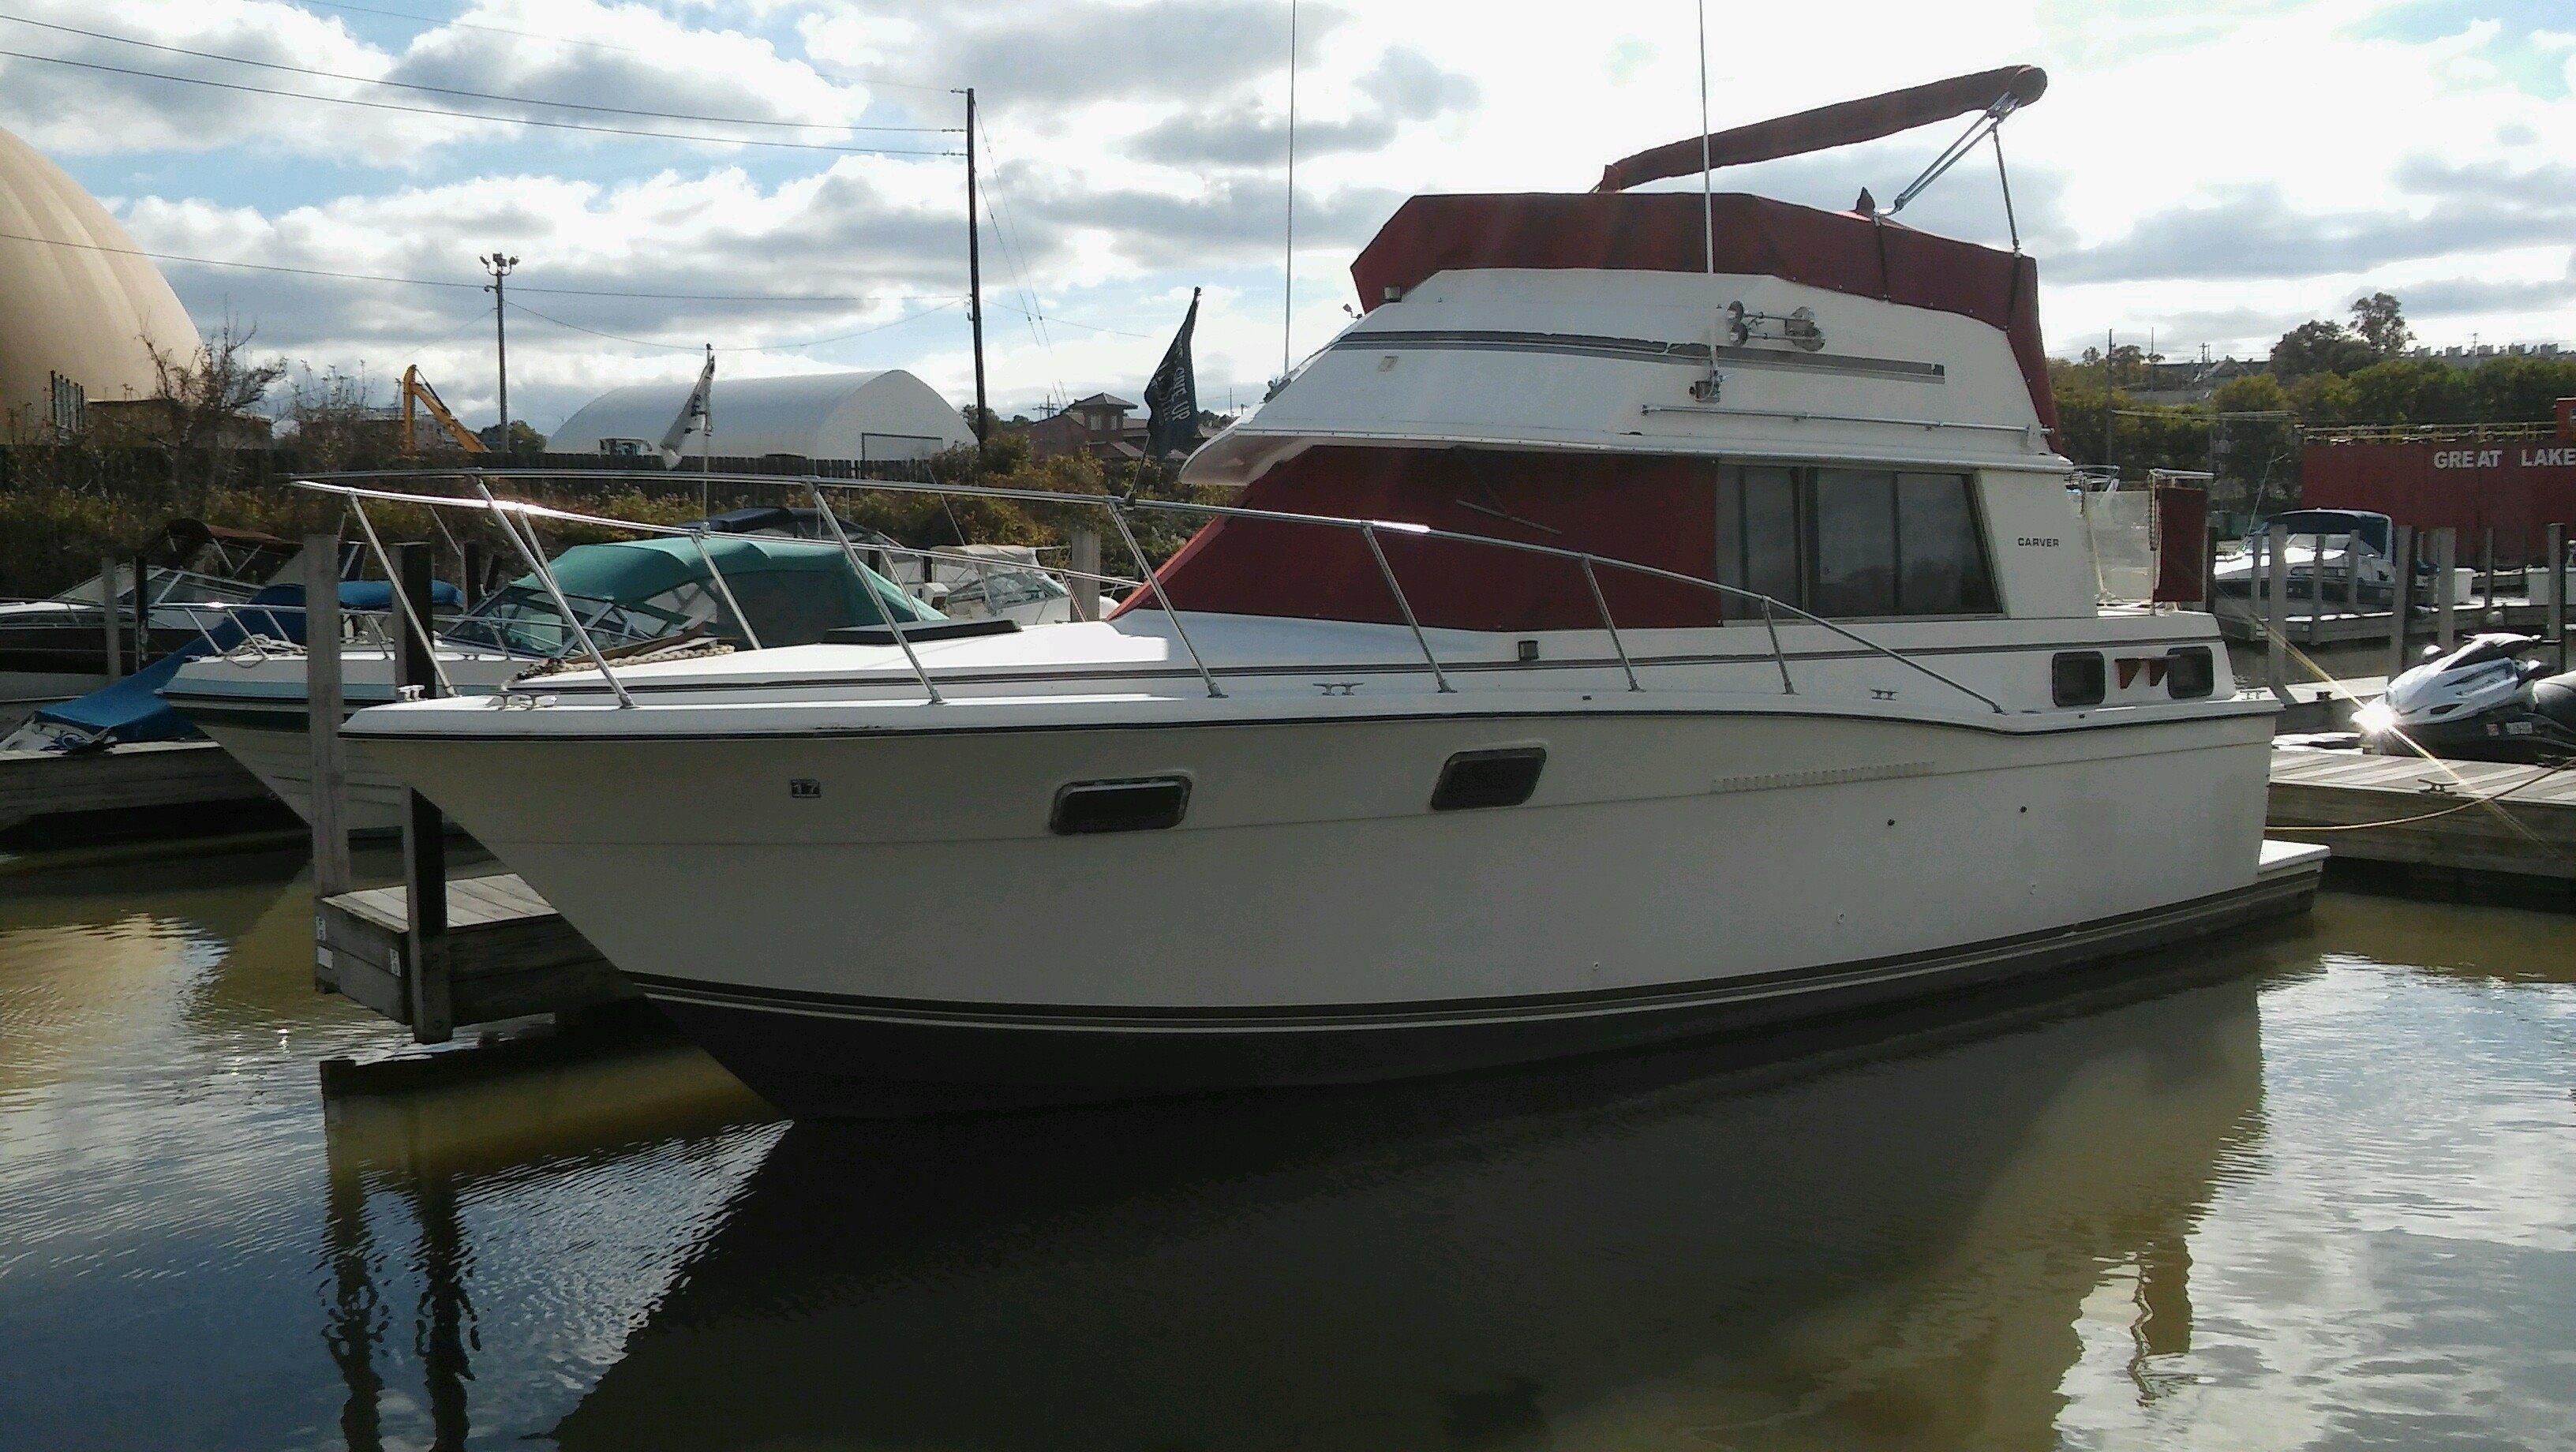 1982 Carver 30 Aft Cabin Power Boat For Sale Www